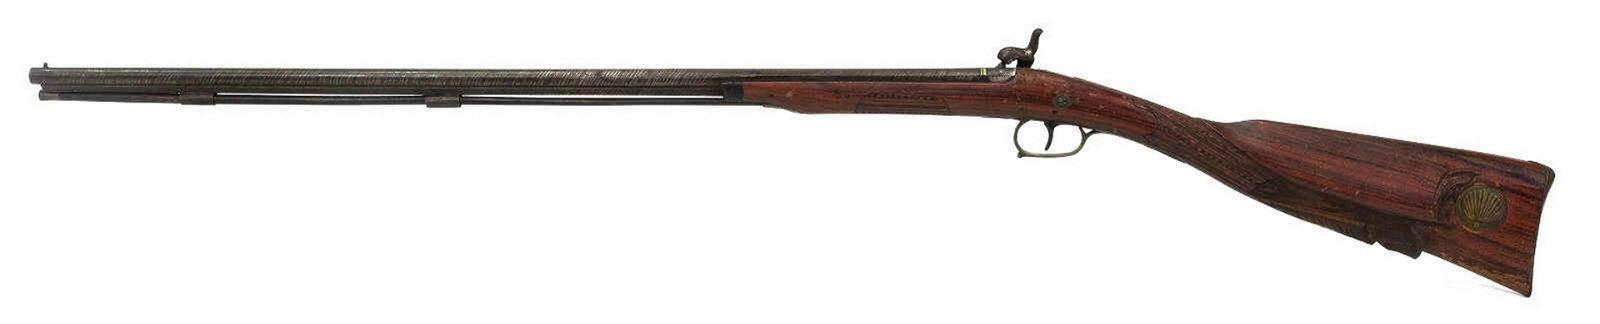 ANTIQUE BRAZILIAN PERCUSSION SMOOTHBORE LONG GUN